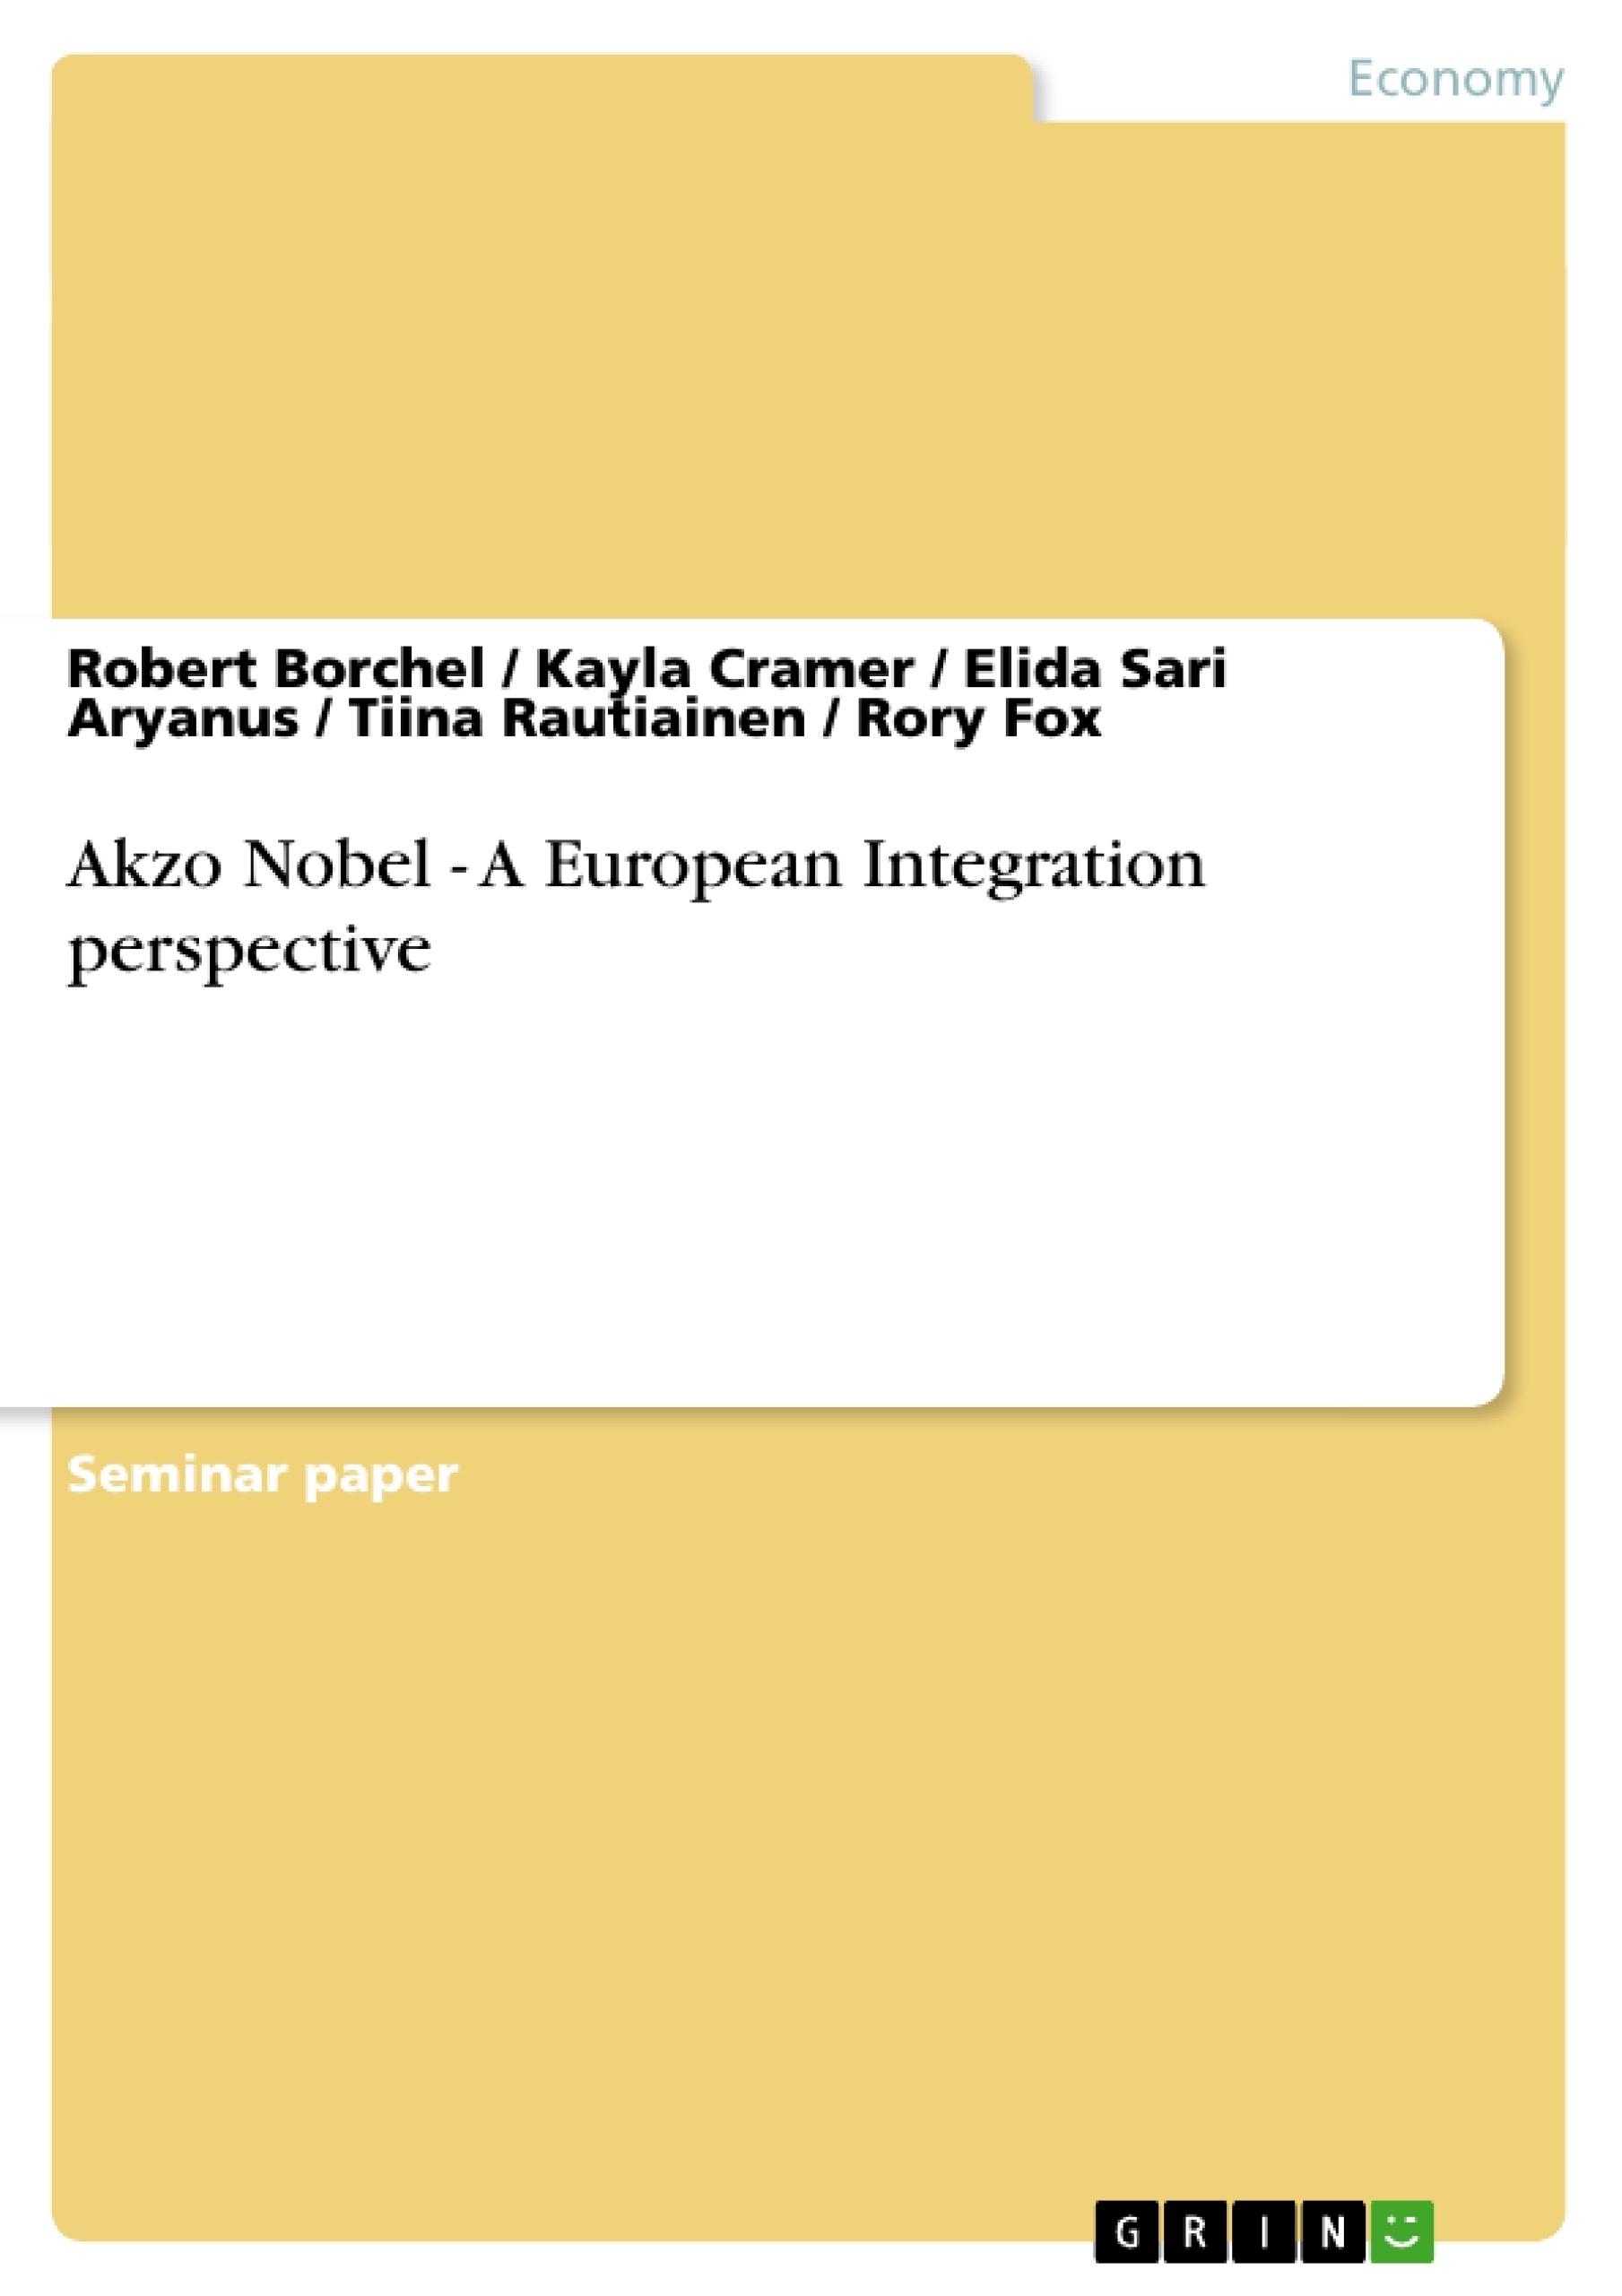 Title: Akzo Nobel - A European Integration perspective